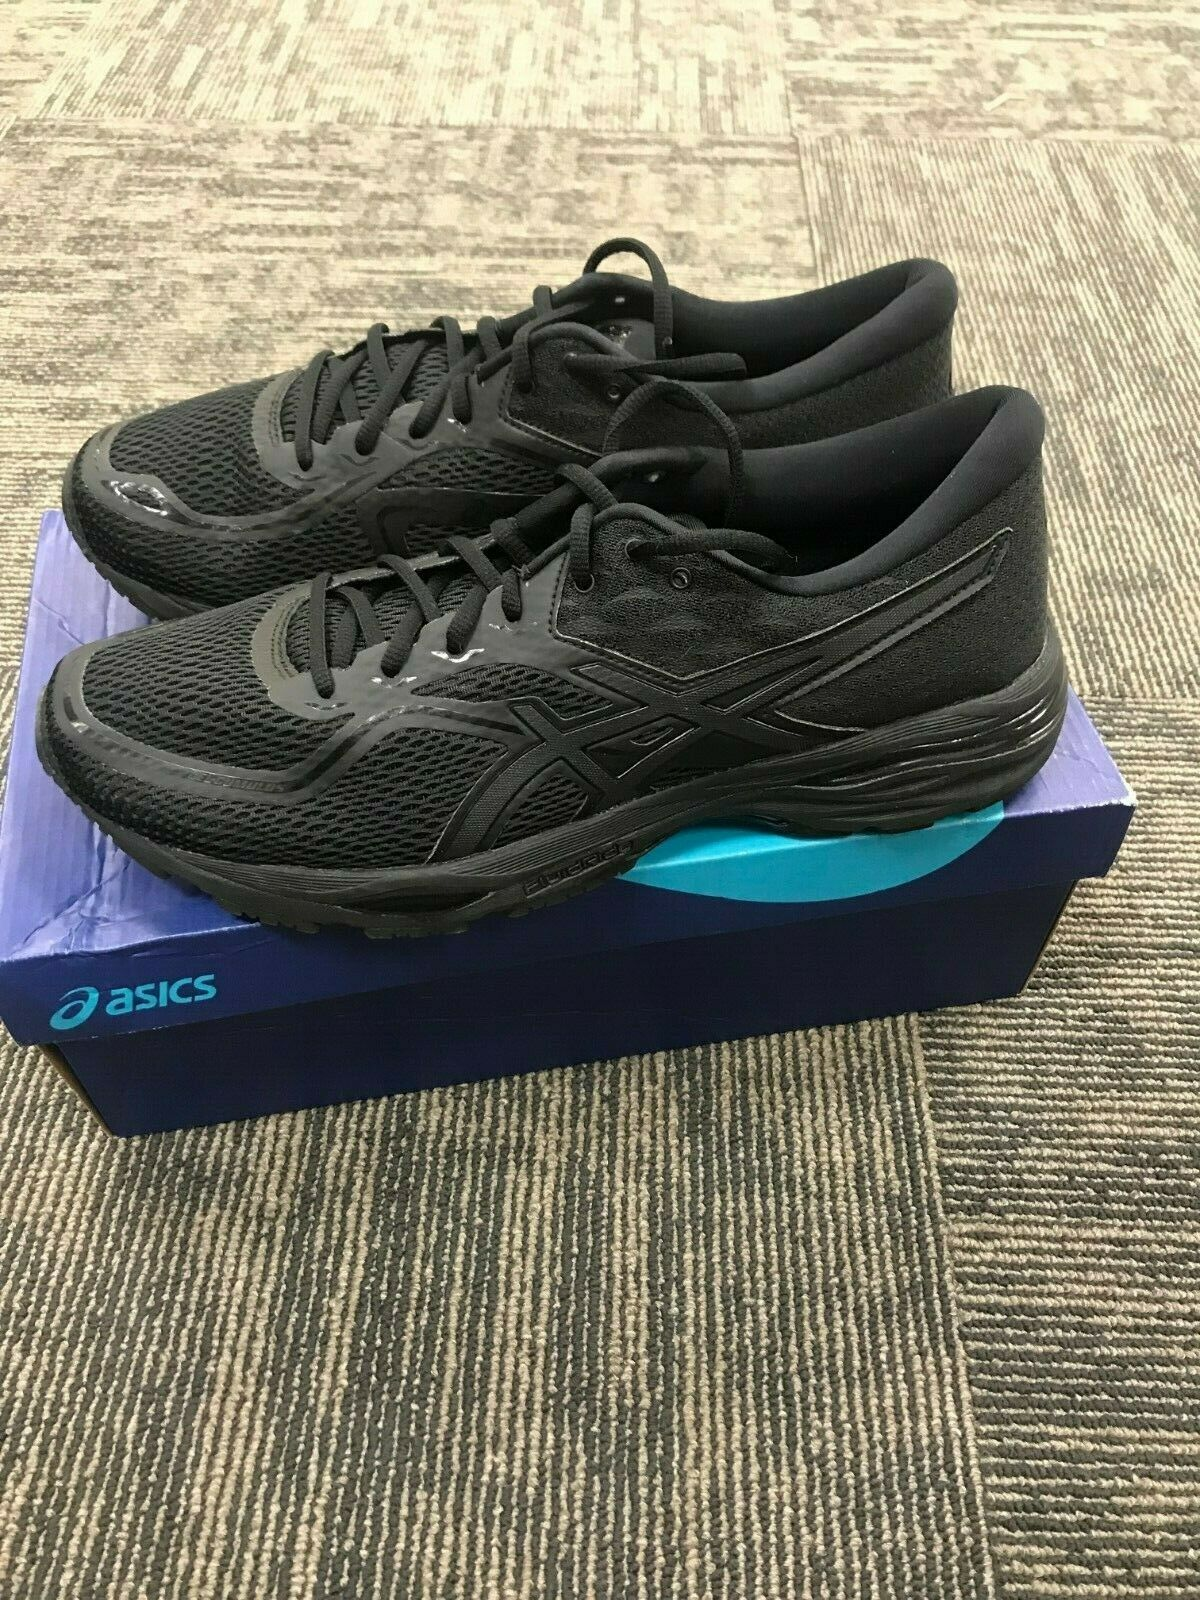 ASICS Gel-Cumulus 19 shoes - Men's Running shoes SKU T7B3N.9090 Size 12